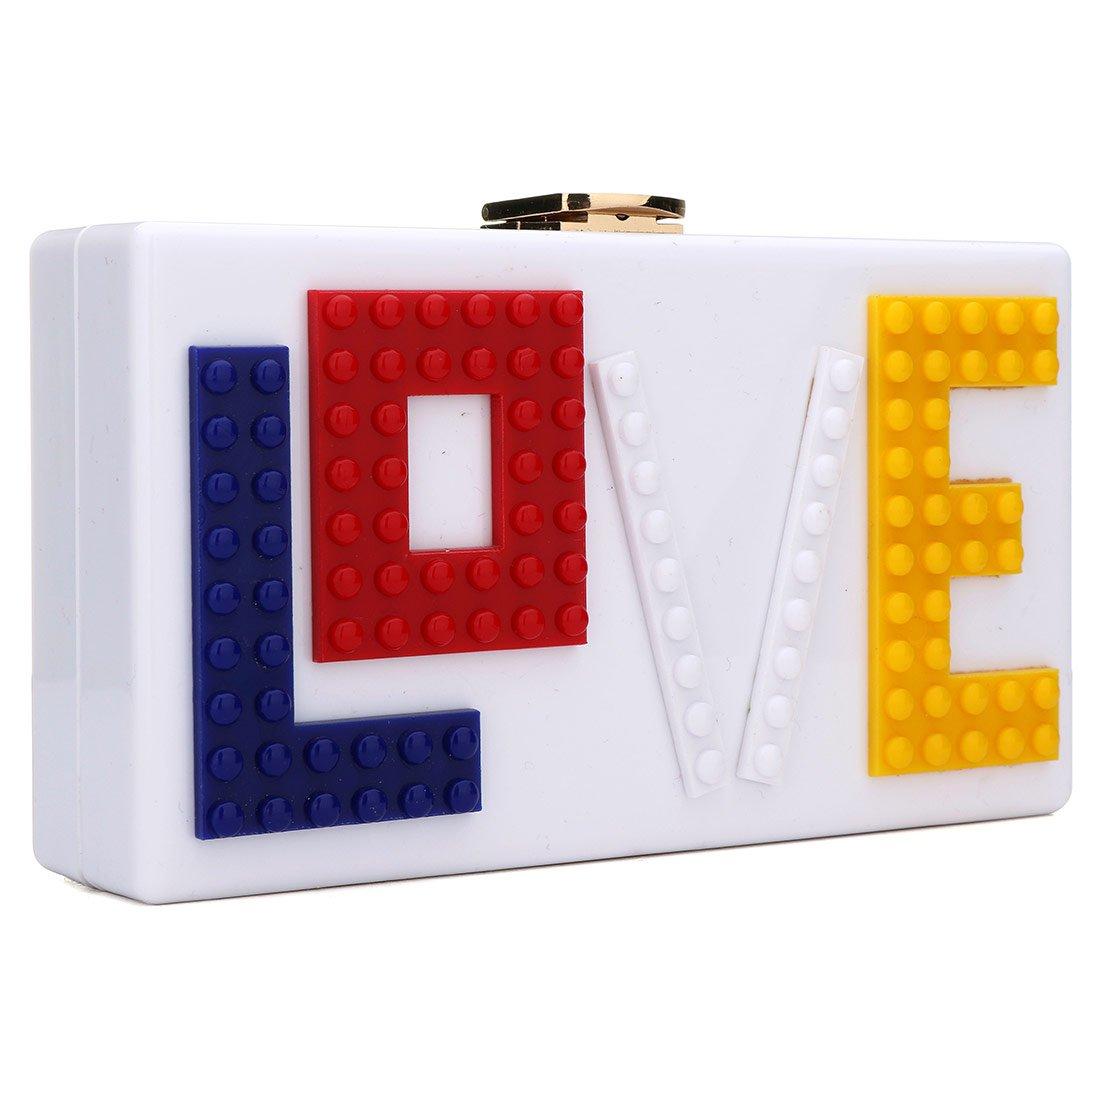 KNUS Love Acrylic Clutch Evening Bag Purse Handbag for Women Ladies Ideal Gift (White)